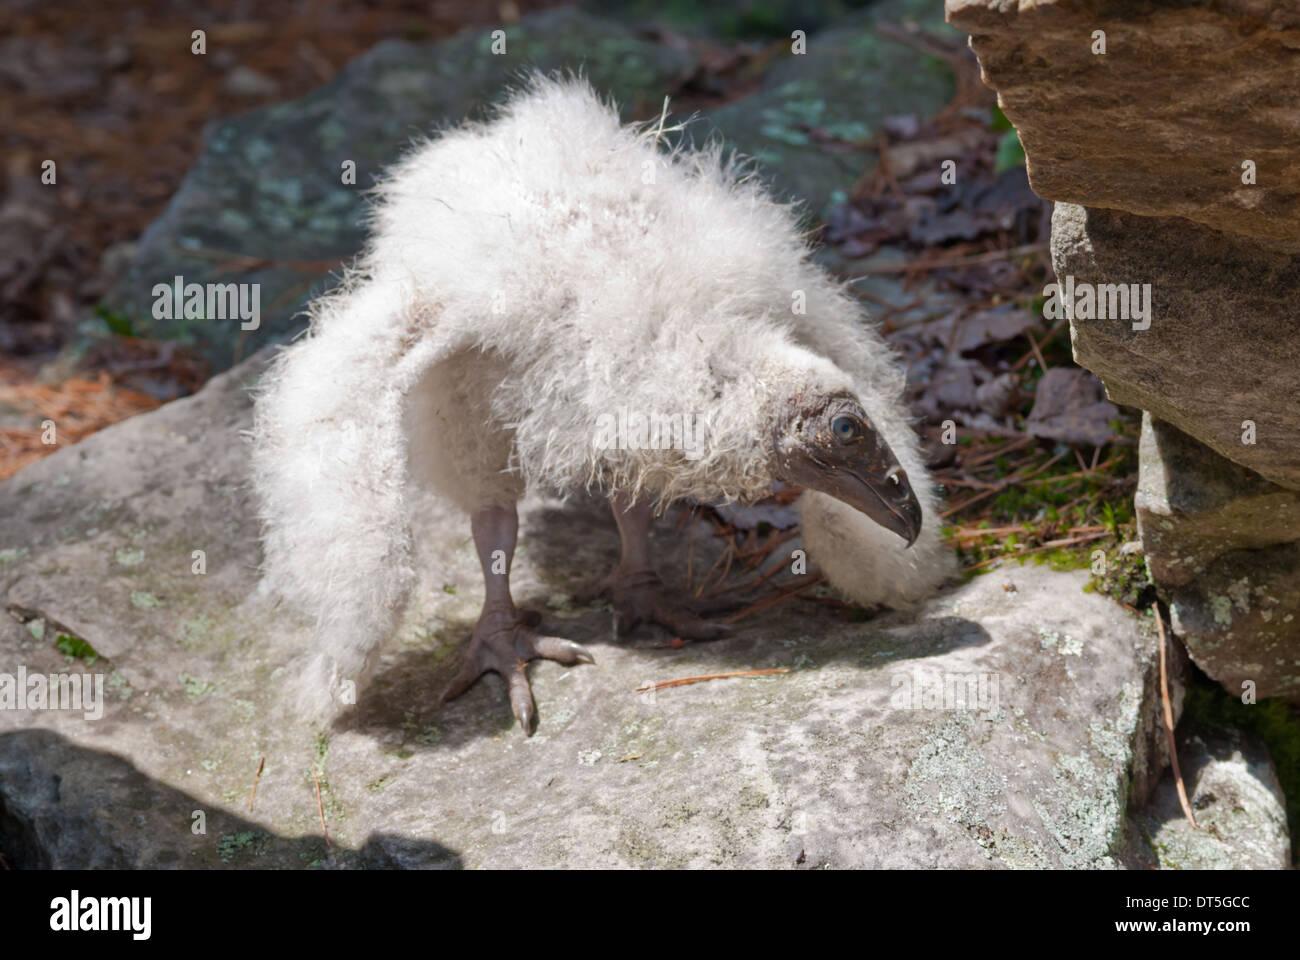 turkey-vulture-chick-cathartes-aura-stan